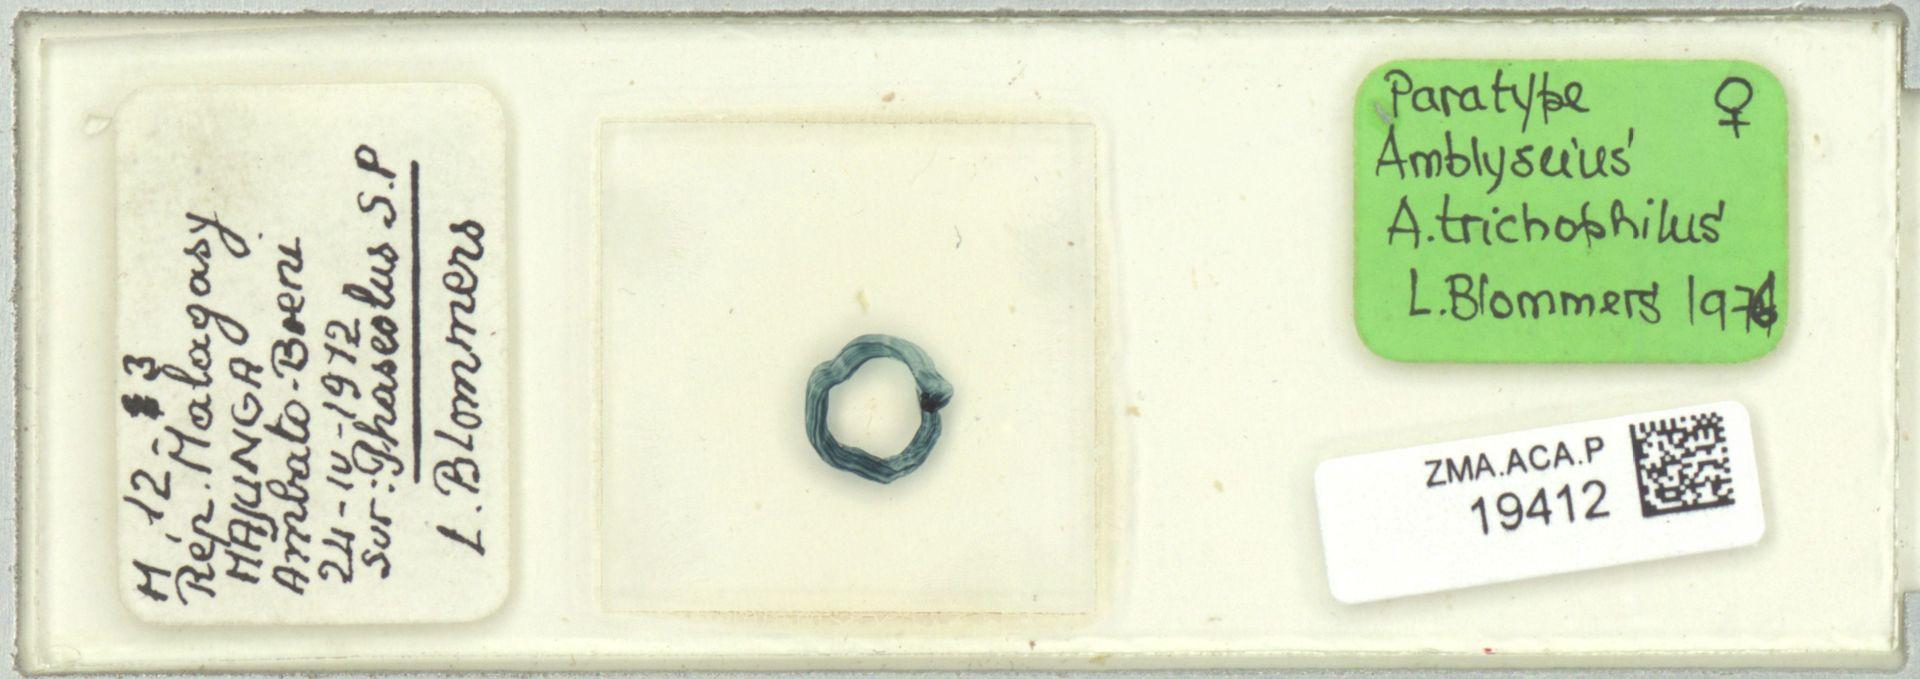 ZMA.ACA.P.19412   Amblyseius (Amblyseius) trichophilus Blommers, 1976